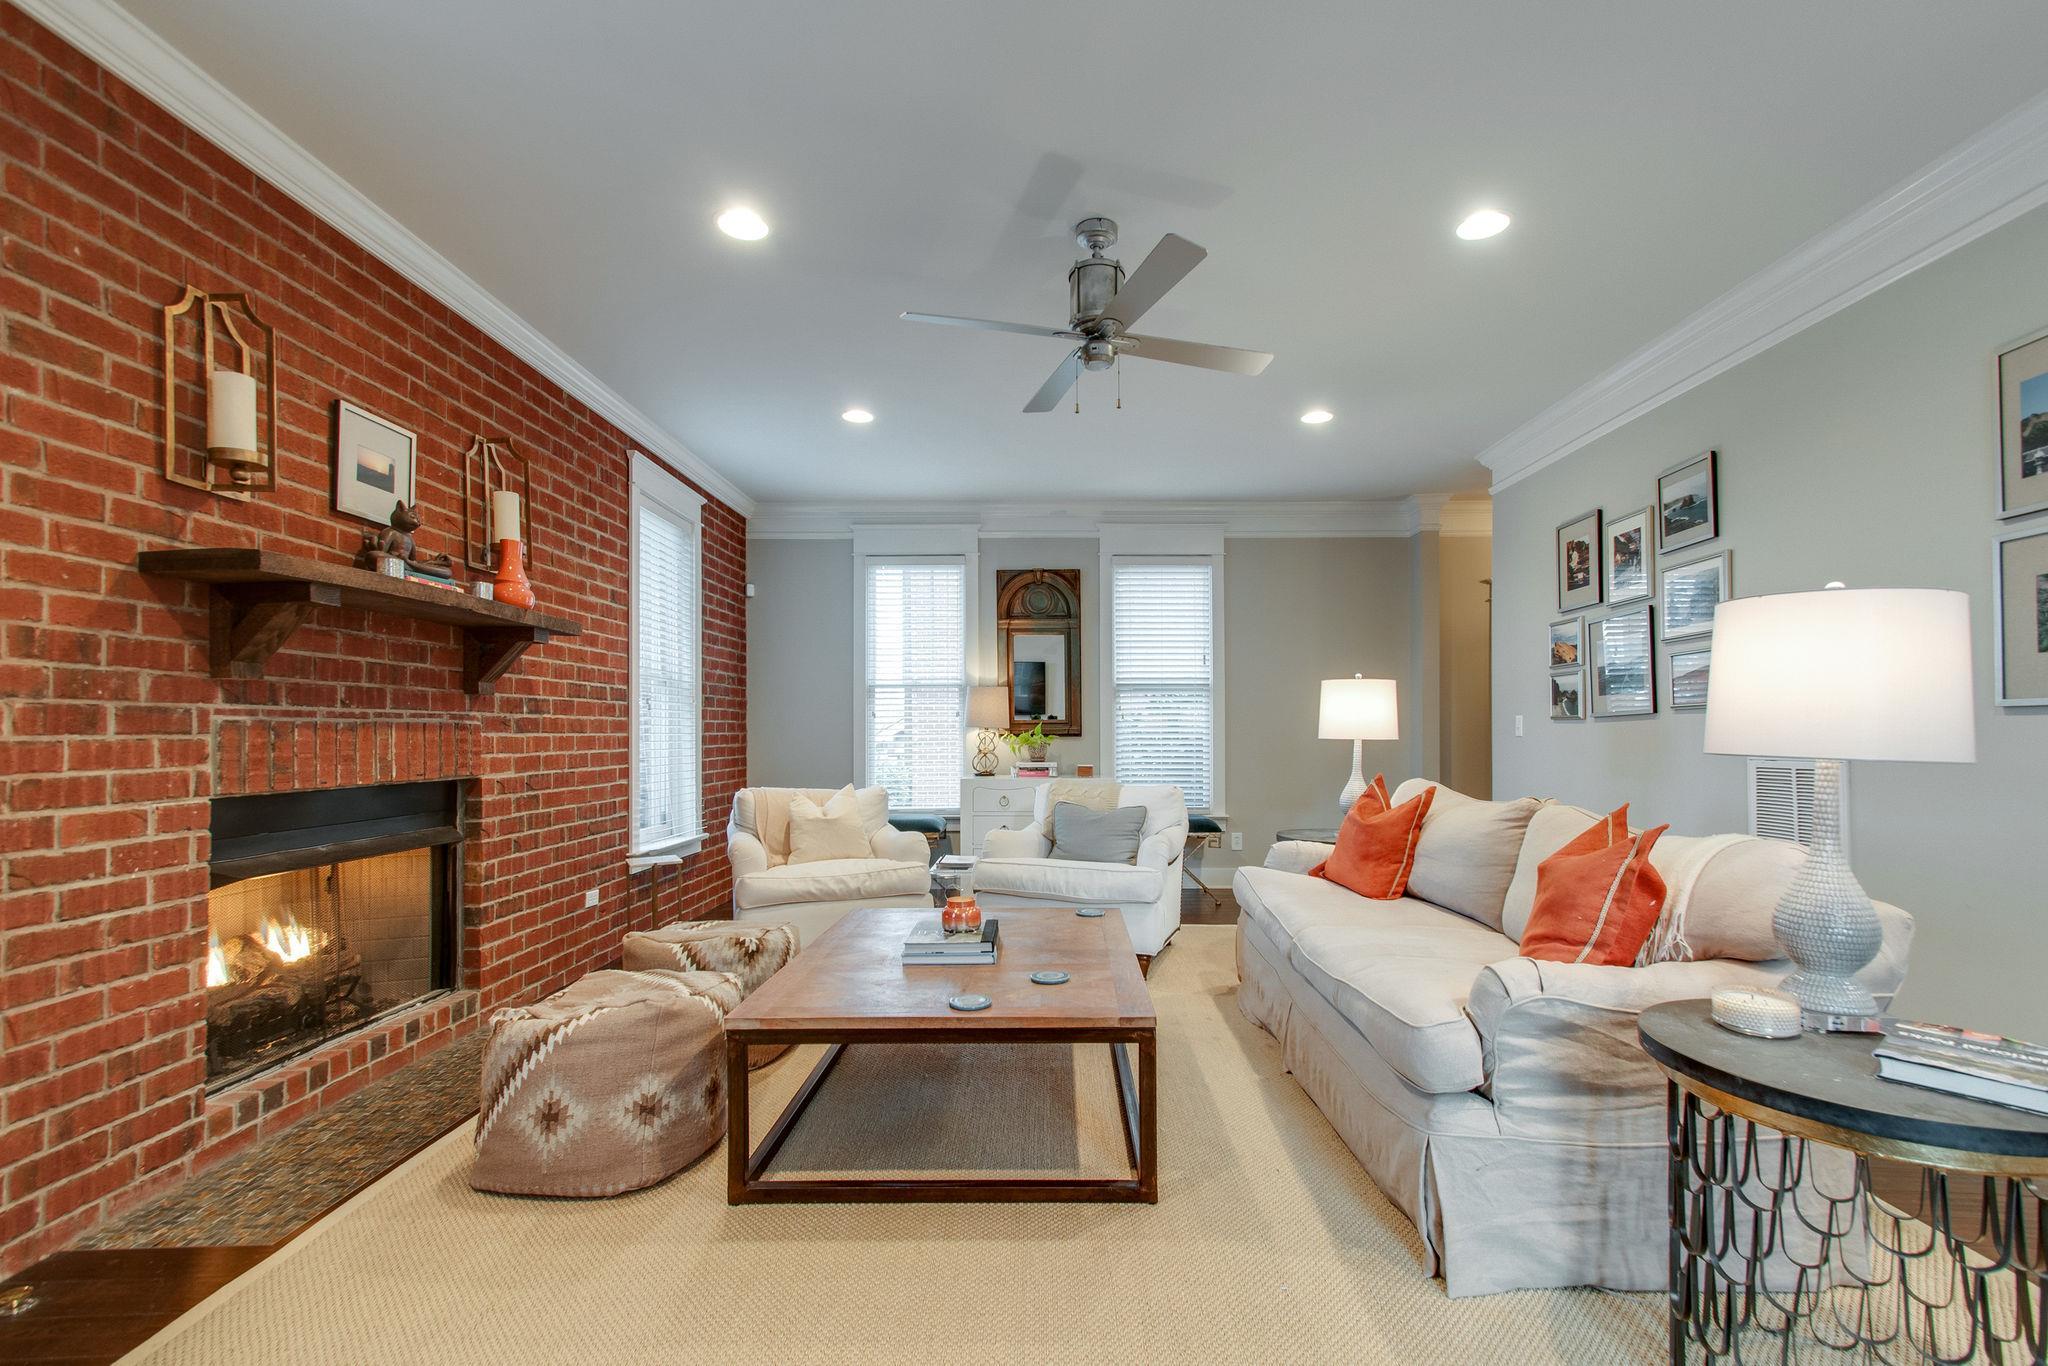 1015 Caruthers Ave, Nashville, TN 37204 - Nashville, TN real estate listing